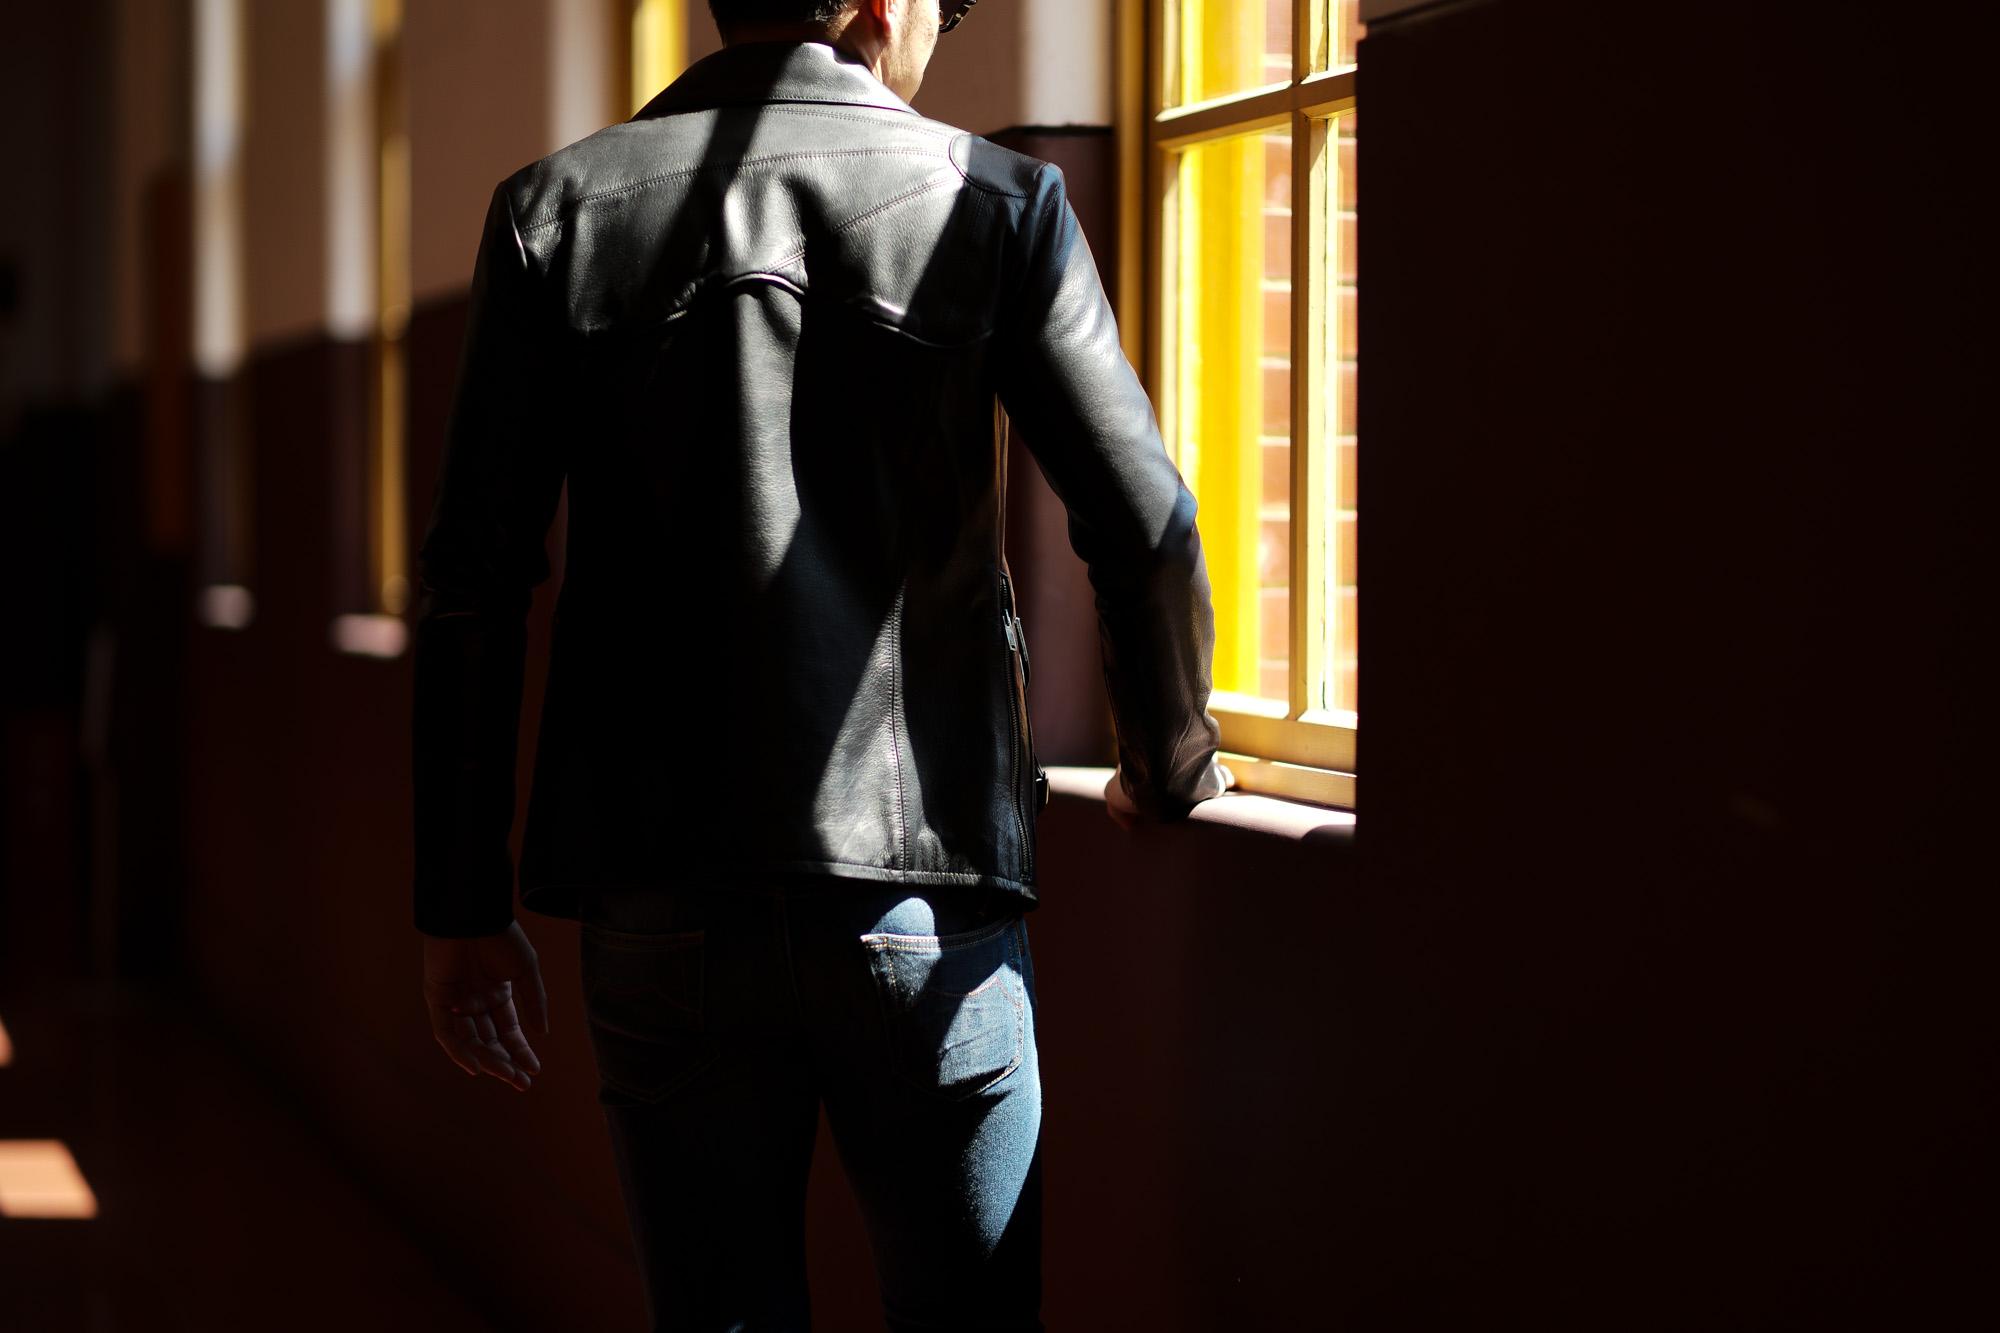 Cuervo (クエルボ) Satisfaction Leather Collection (サティスファクション レザー コレクション) East West(イーストウエスト)  SMOKE(スモーク) BUFFALO LEATHER (バッファロー レザー) レザージャケット BROWN(ブラウン) MADE IN JAPAN (日本製) 2019 春夏 【ご予約受付中】 愛知 名古屋 altoediritto アルトエデリット 洋服屋 レザージャケット サウスパラディソ eastwest